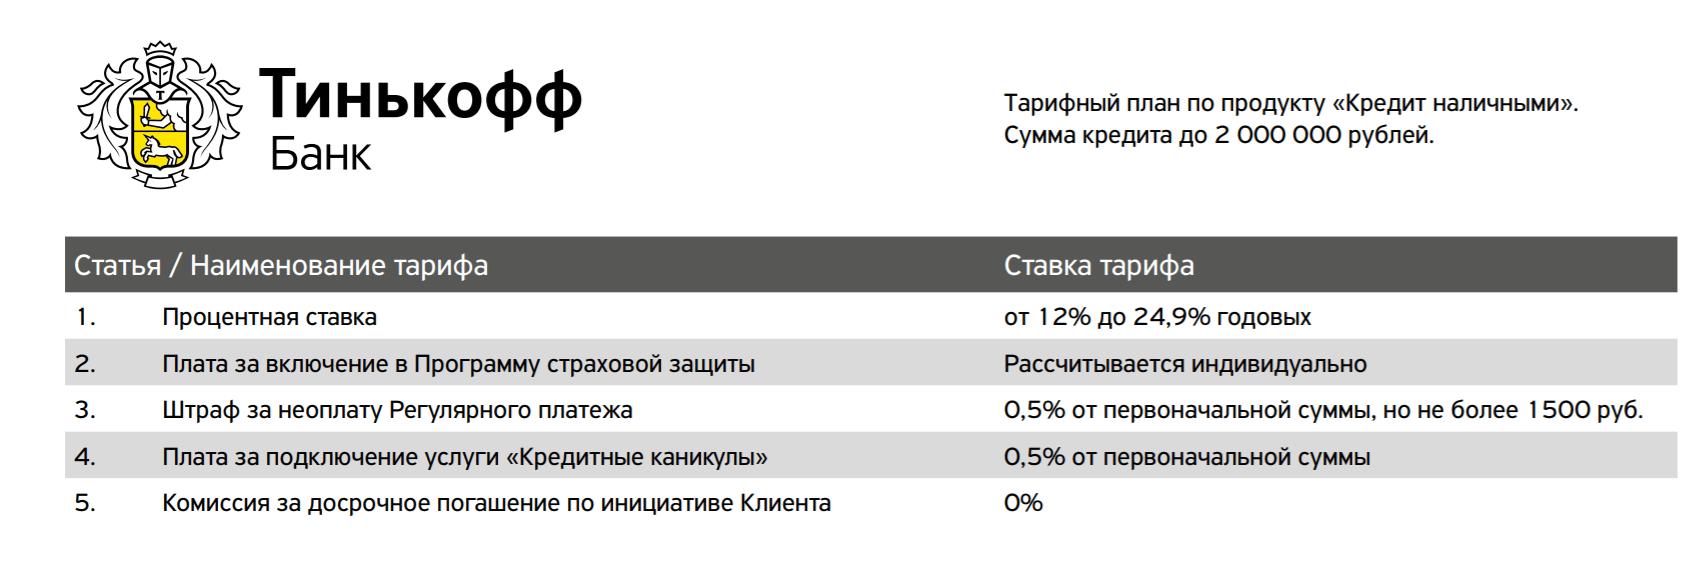 Условия кредита в Тинькофф